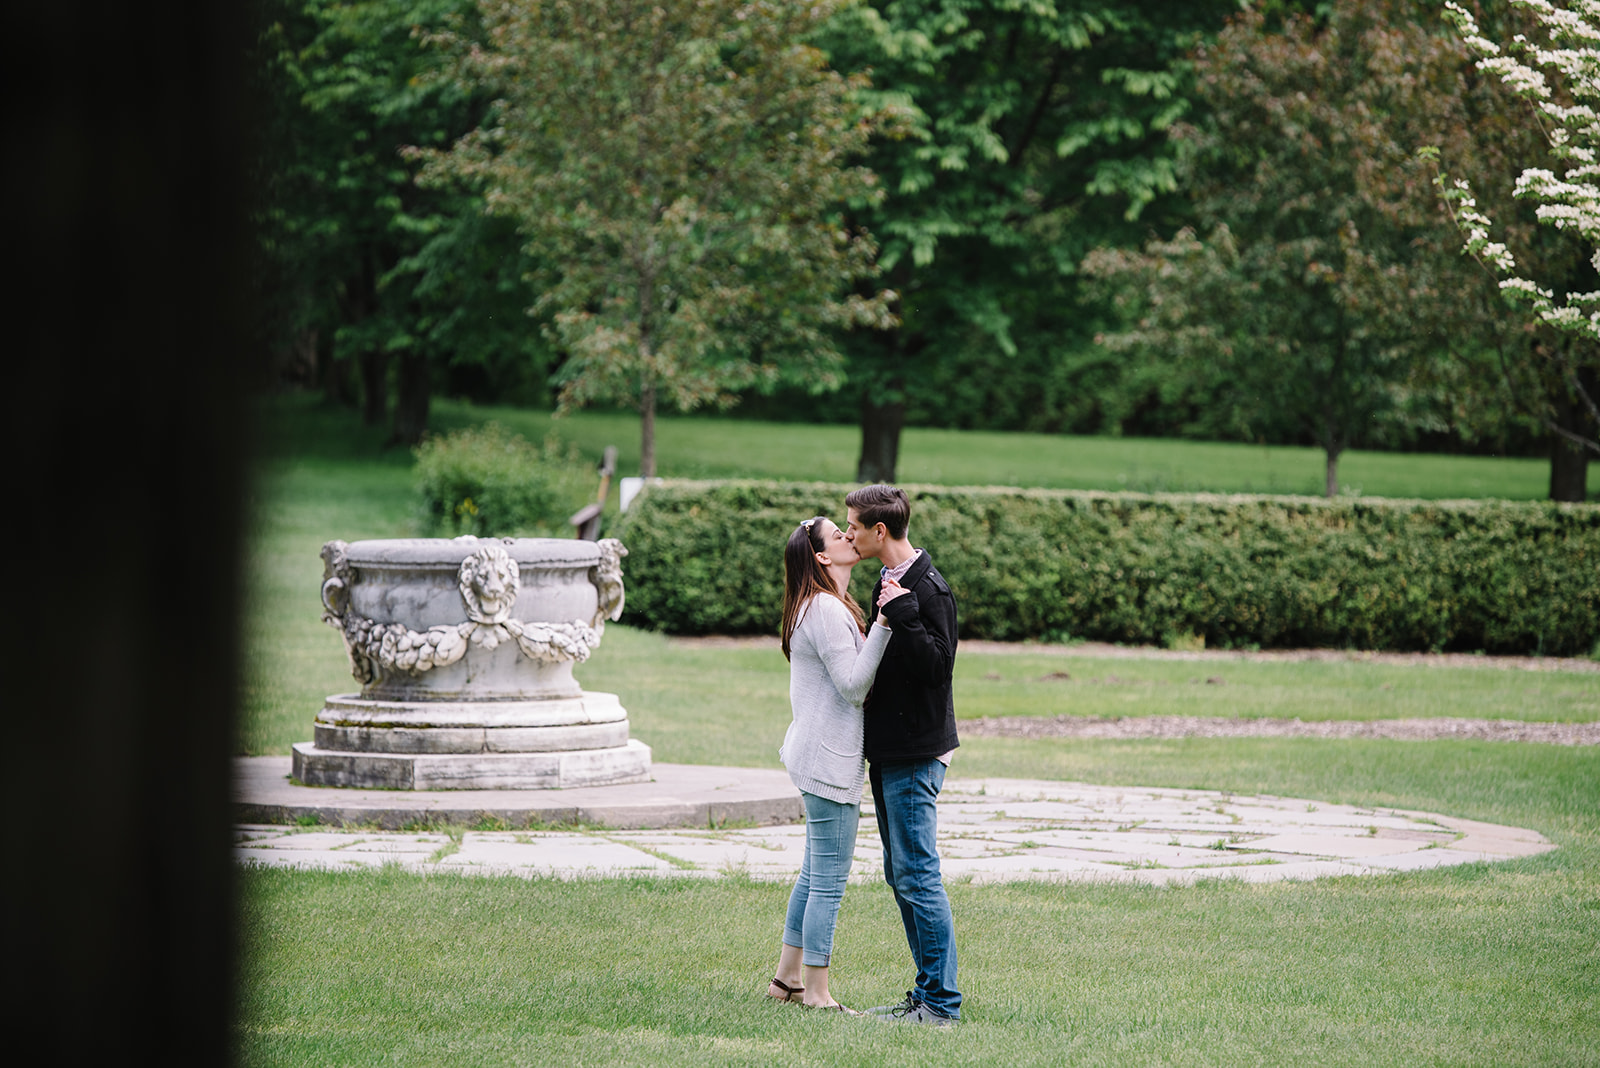 Surprise_Proposal-_NJ_Botanical_Gardens-_Greg_and_Jackie-New_Jersey-_Olivia_Christina_Photo-5.jpg